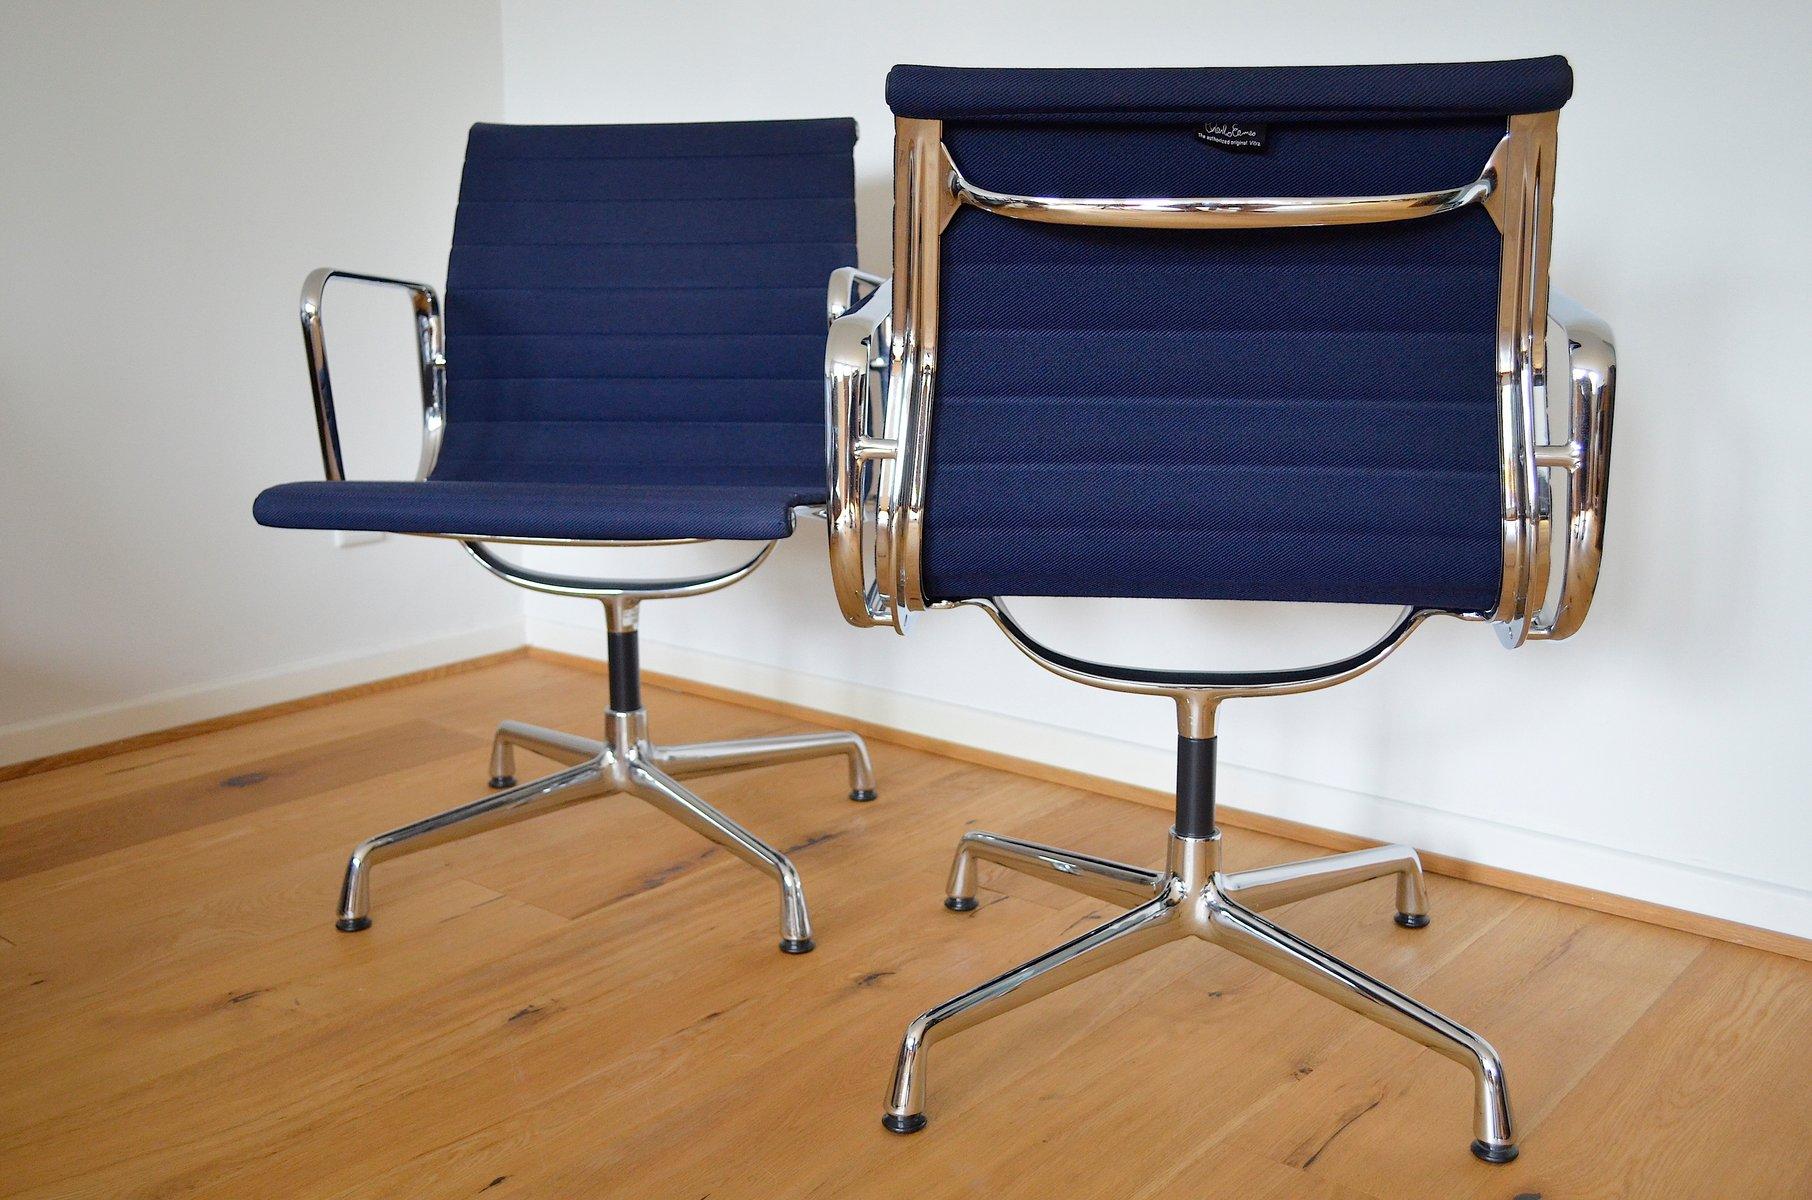 Vintage ea aluminium stühle von charles ray eames für vitra